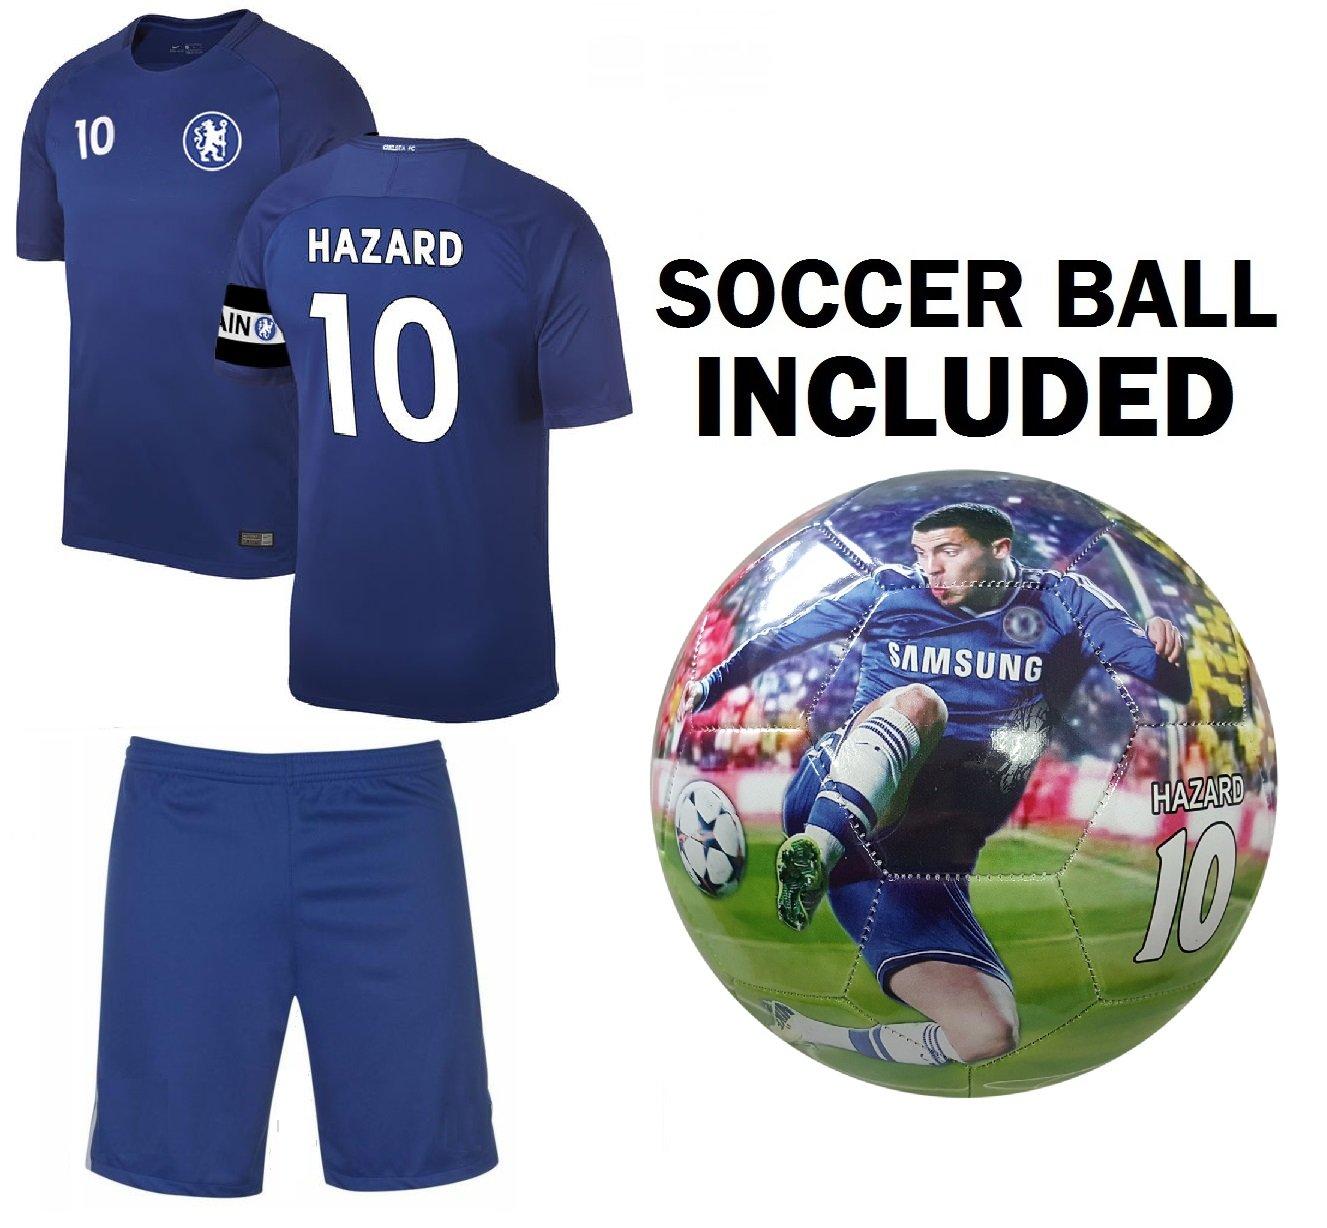 Hazard Kidsジャージー+短パン+ボール=プレミアムギフトセットチェルシーEden Hazard # 10 Youth Soccer Ball Size 5 Football B07BL6QQZ5 YM 8-10 years|ジャージ+ボール YM 8-10 years